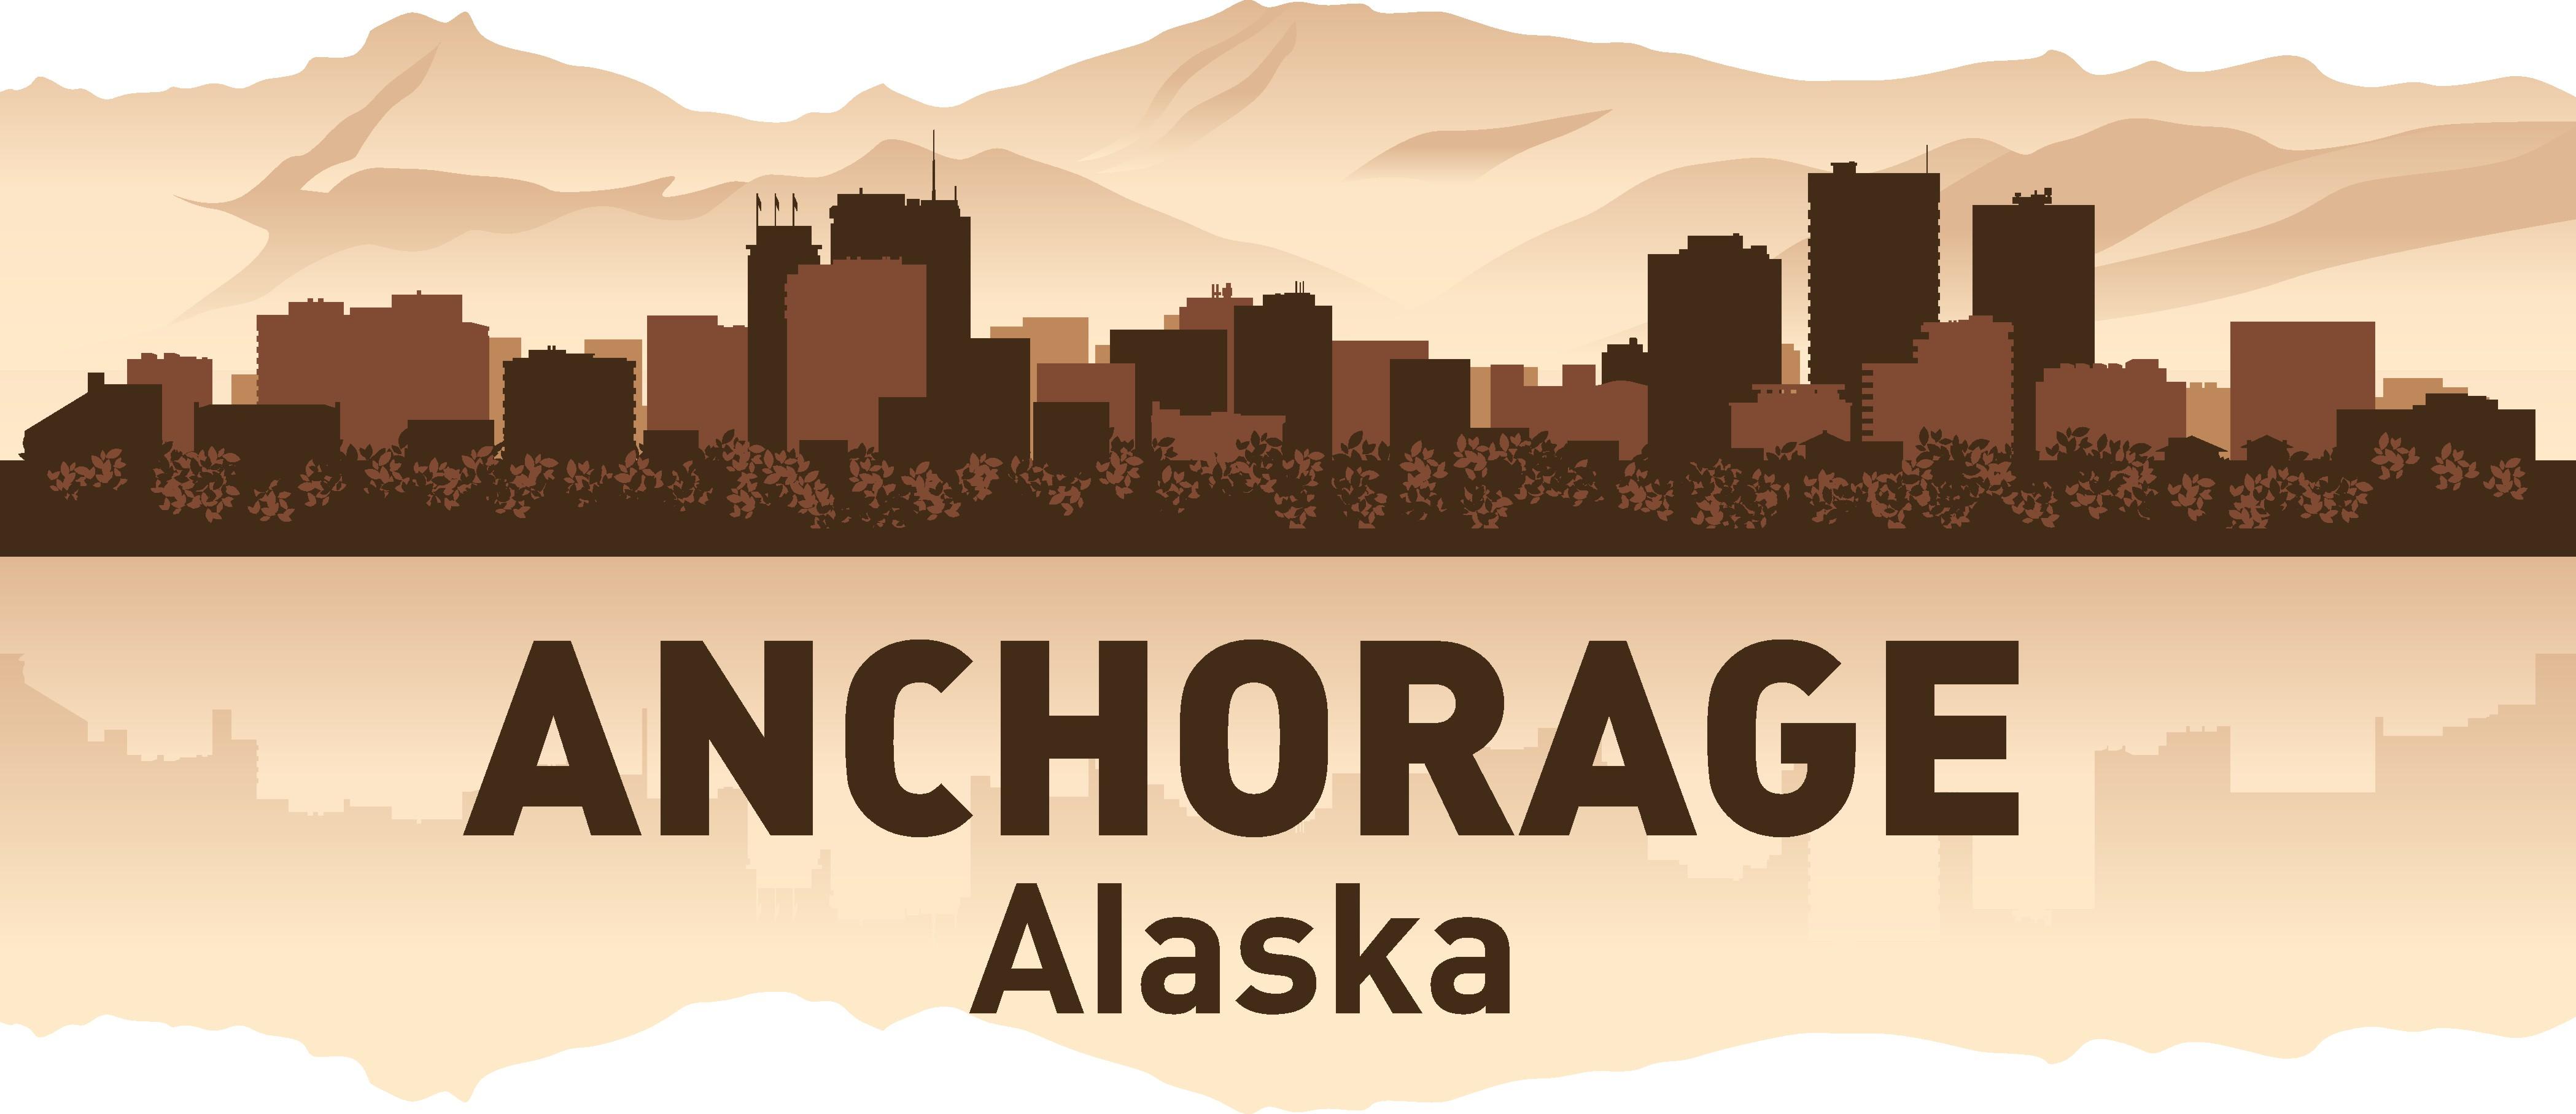 Anchorage Skyline Free Vector